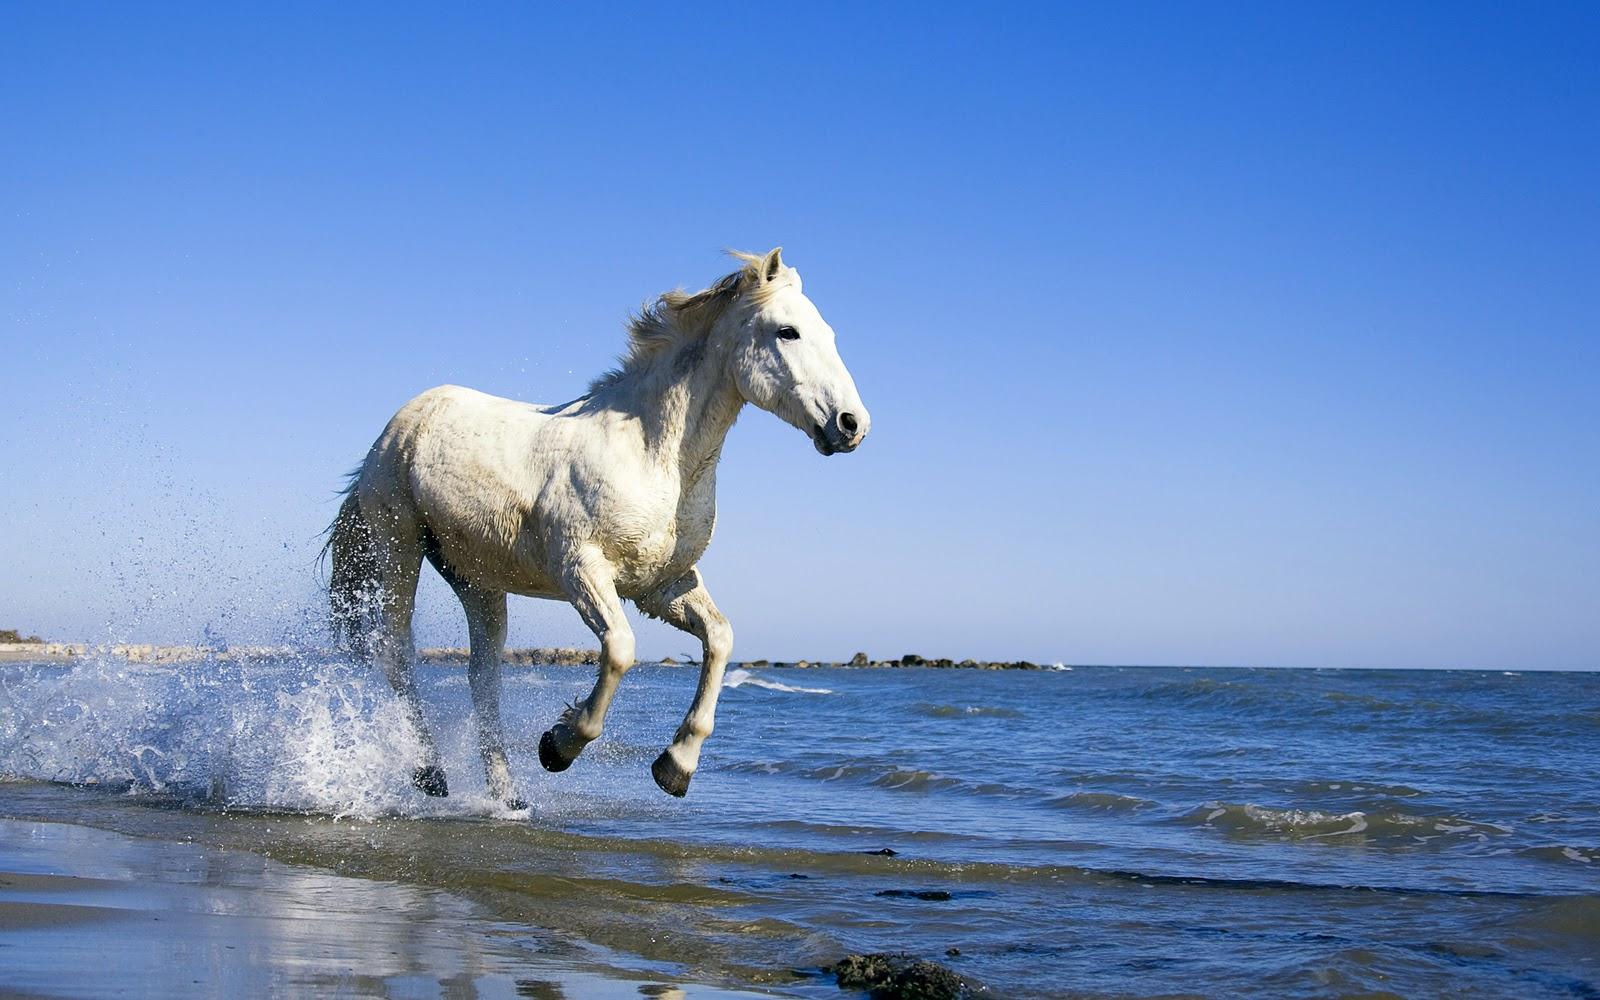 http://3.bp.blogspot.com/_W1ueYt1O3xs/TOey6Mm2AVI/AAAAAAAAXT8/zC1xYhPmxXE/s1600/Horses+Wallpapers+1920x1200.jpg